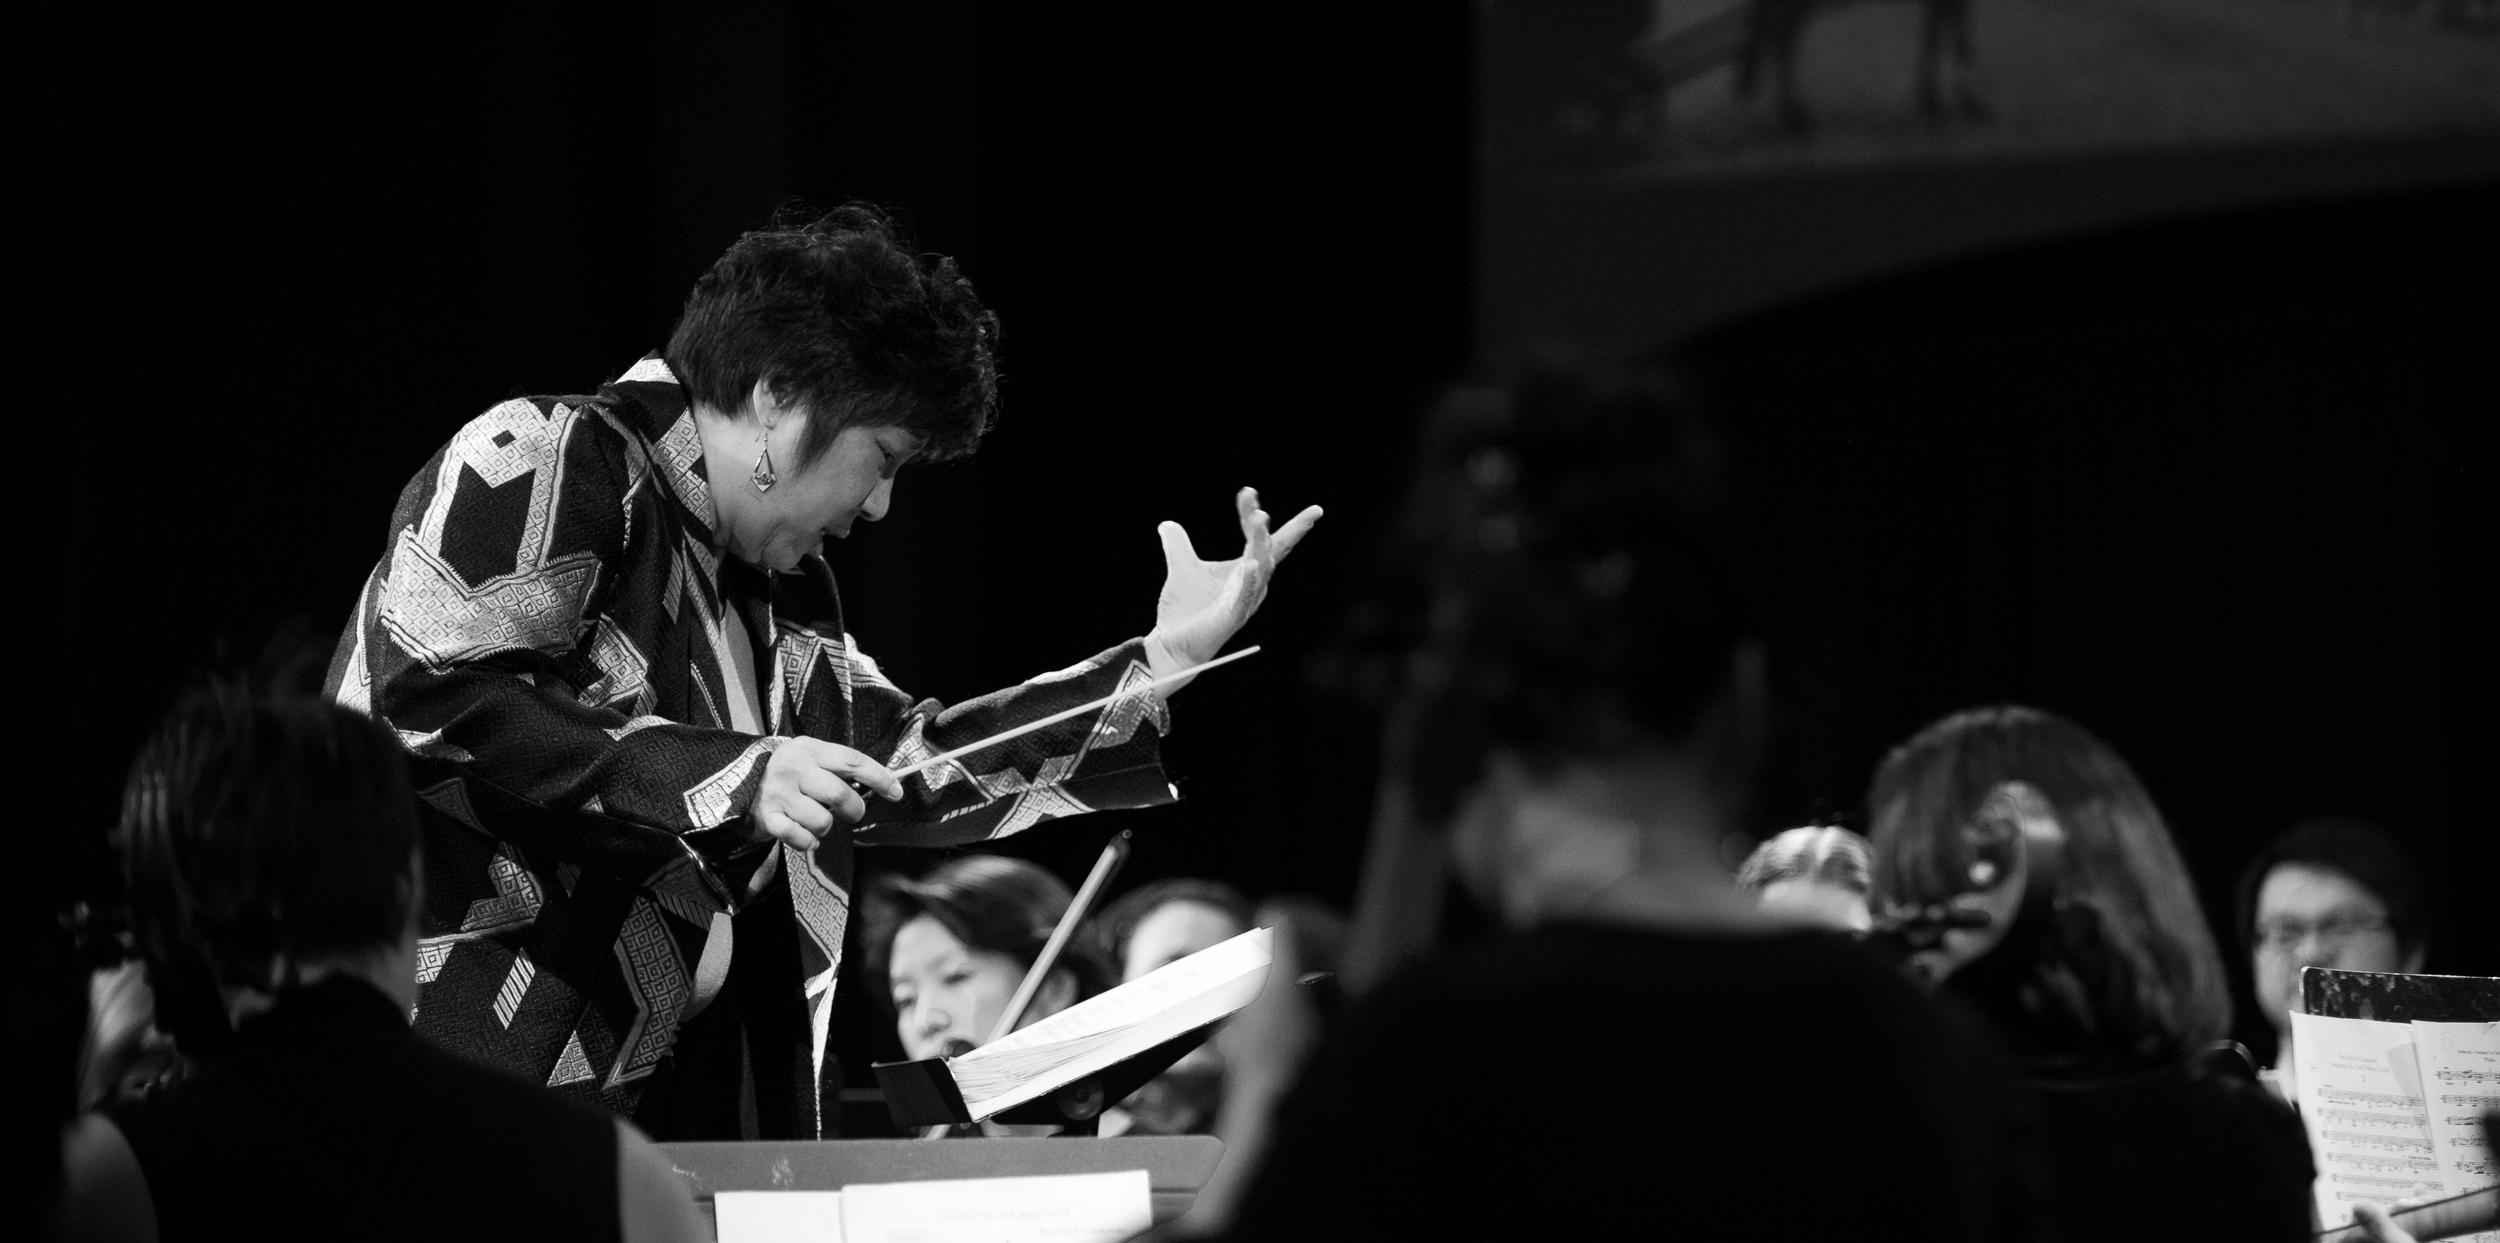 Intense Conductor - 2 - Copy.jpg